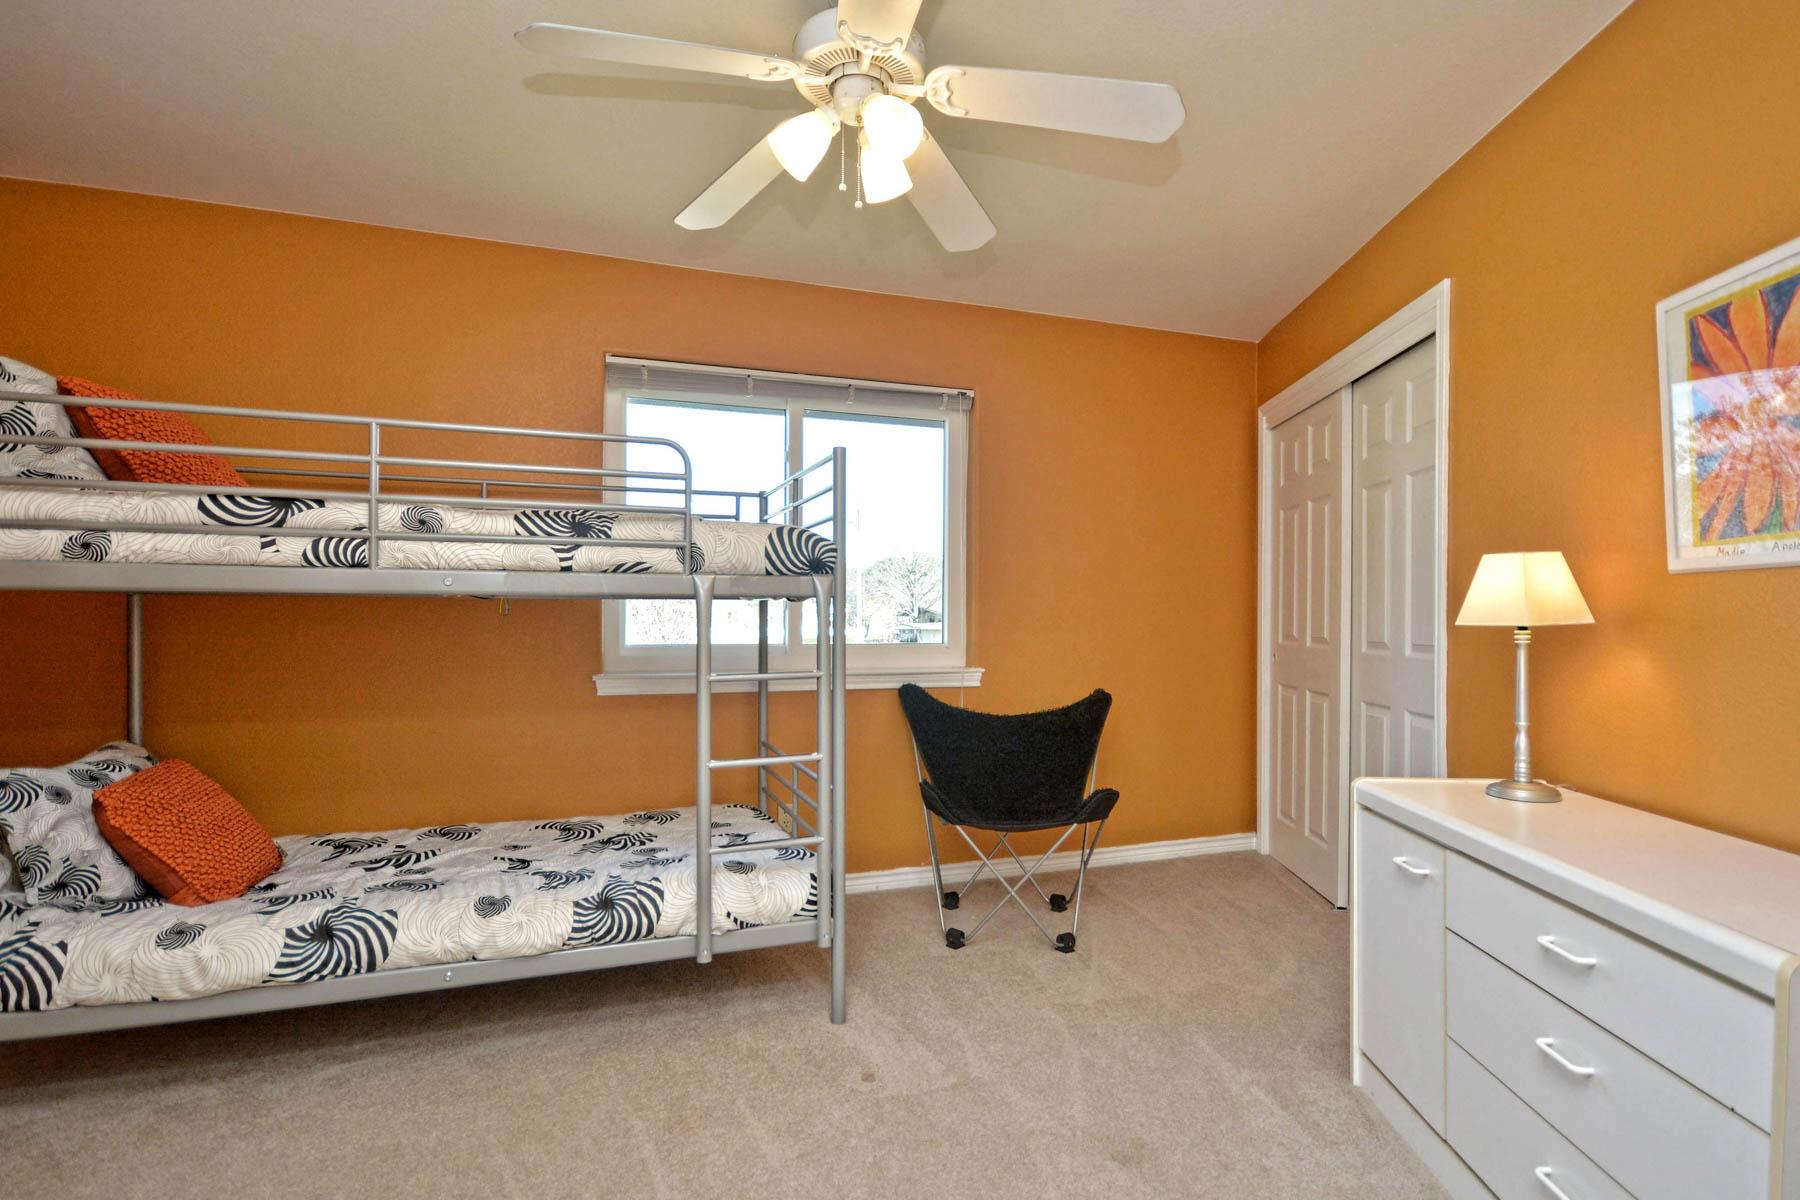 Additional photo for property listing at Enjoy the Good Life on Lake LBJ 110 Circle Pt Kingsland, Texas 78639 United States